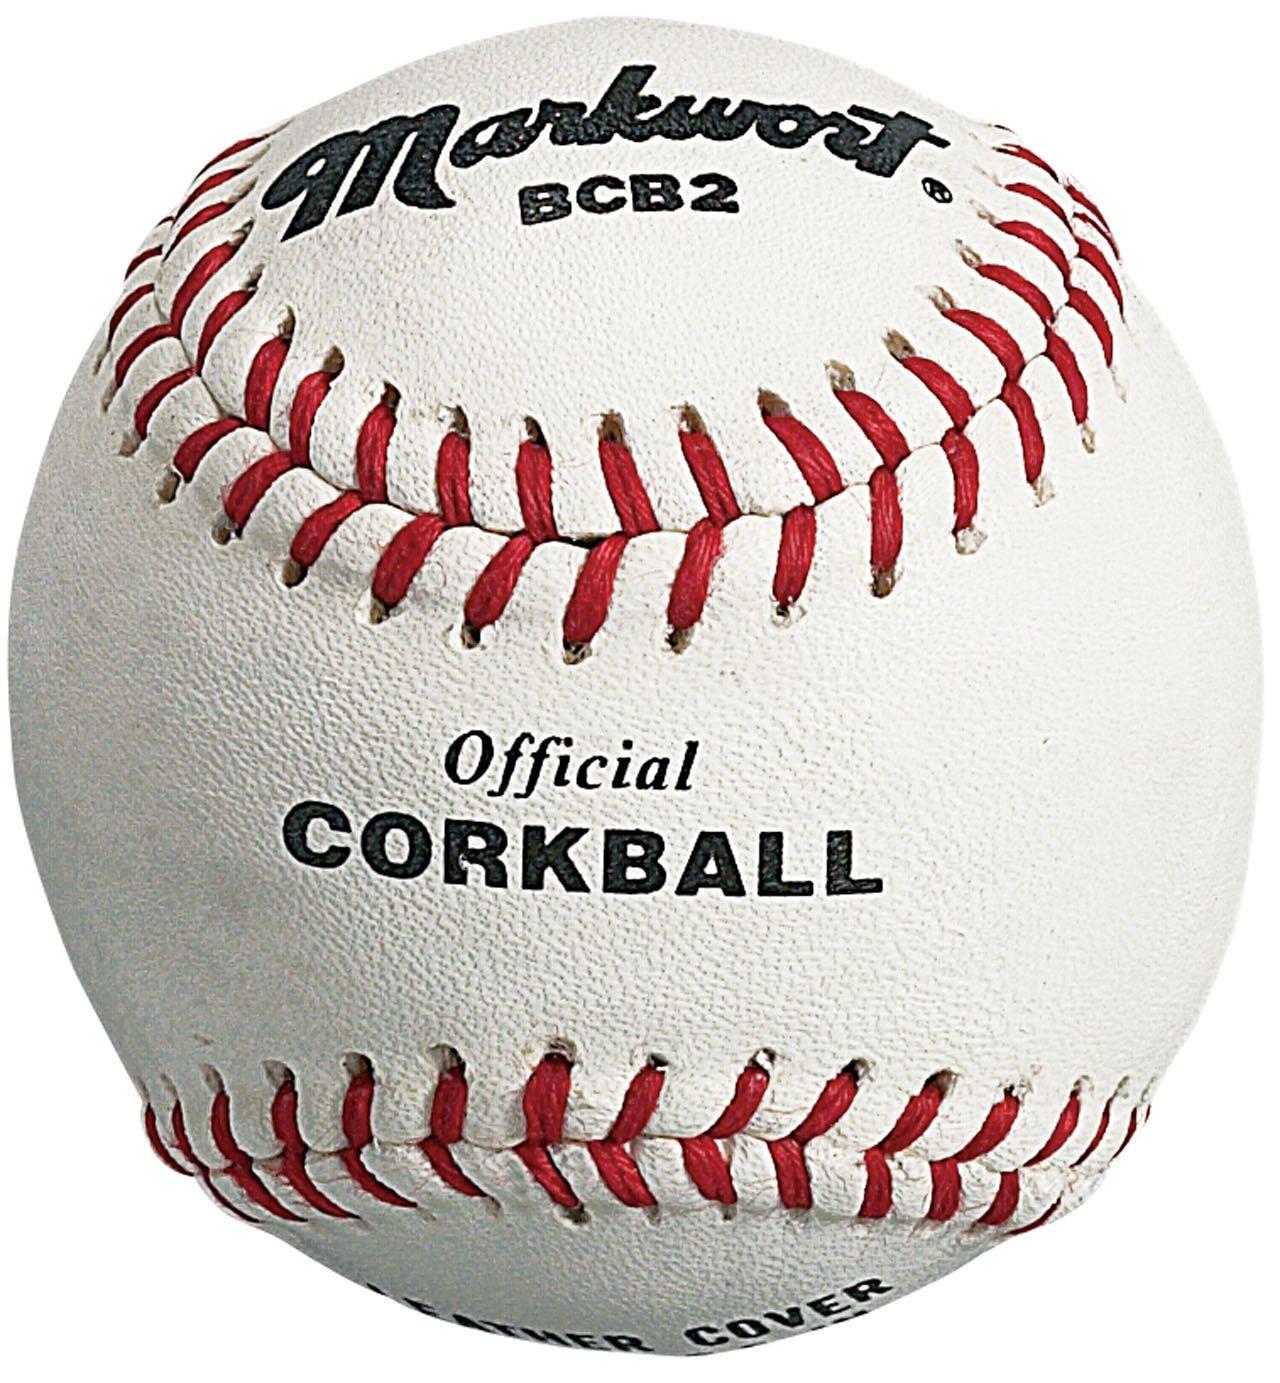 Markwort Markwort Official Corkballsのセットとして販売( 12 ) ) B000VZADI8 B000VZADI8 ホワイト, OR GLORY:f5552ebf --- sayselfiee.com